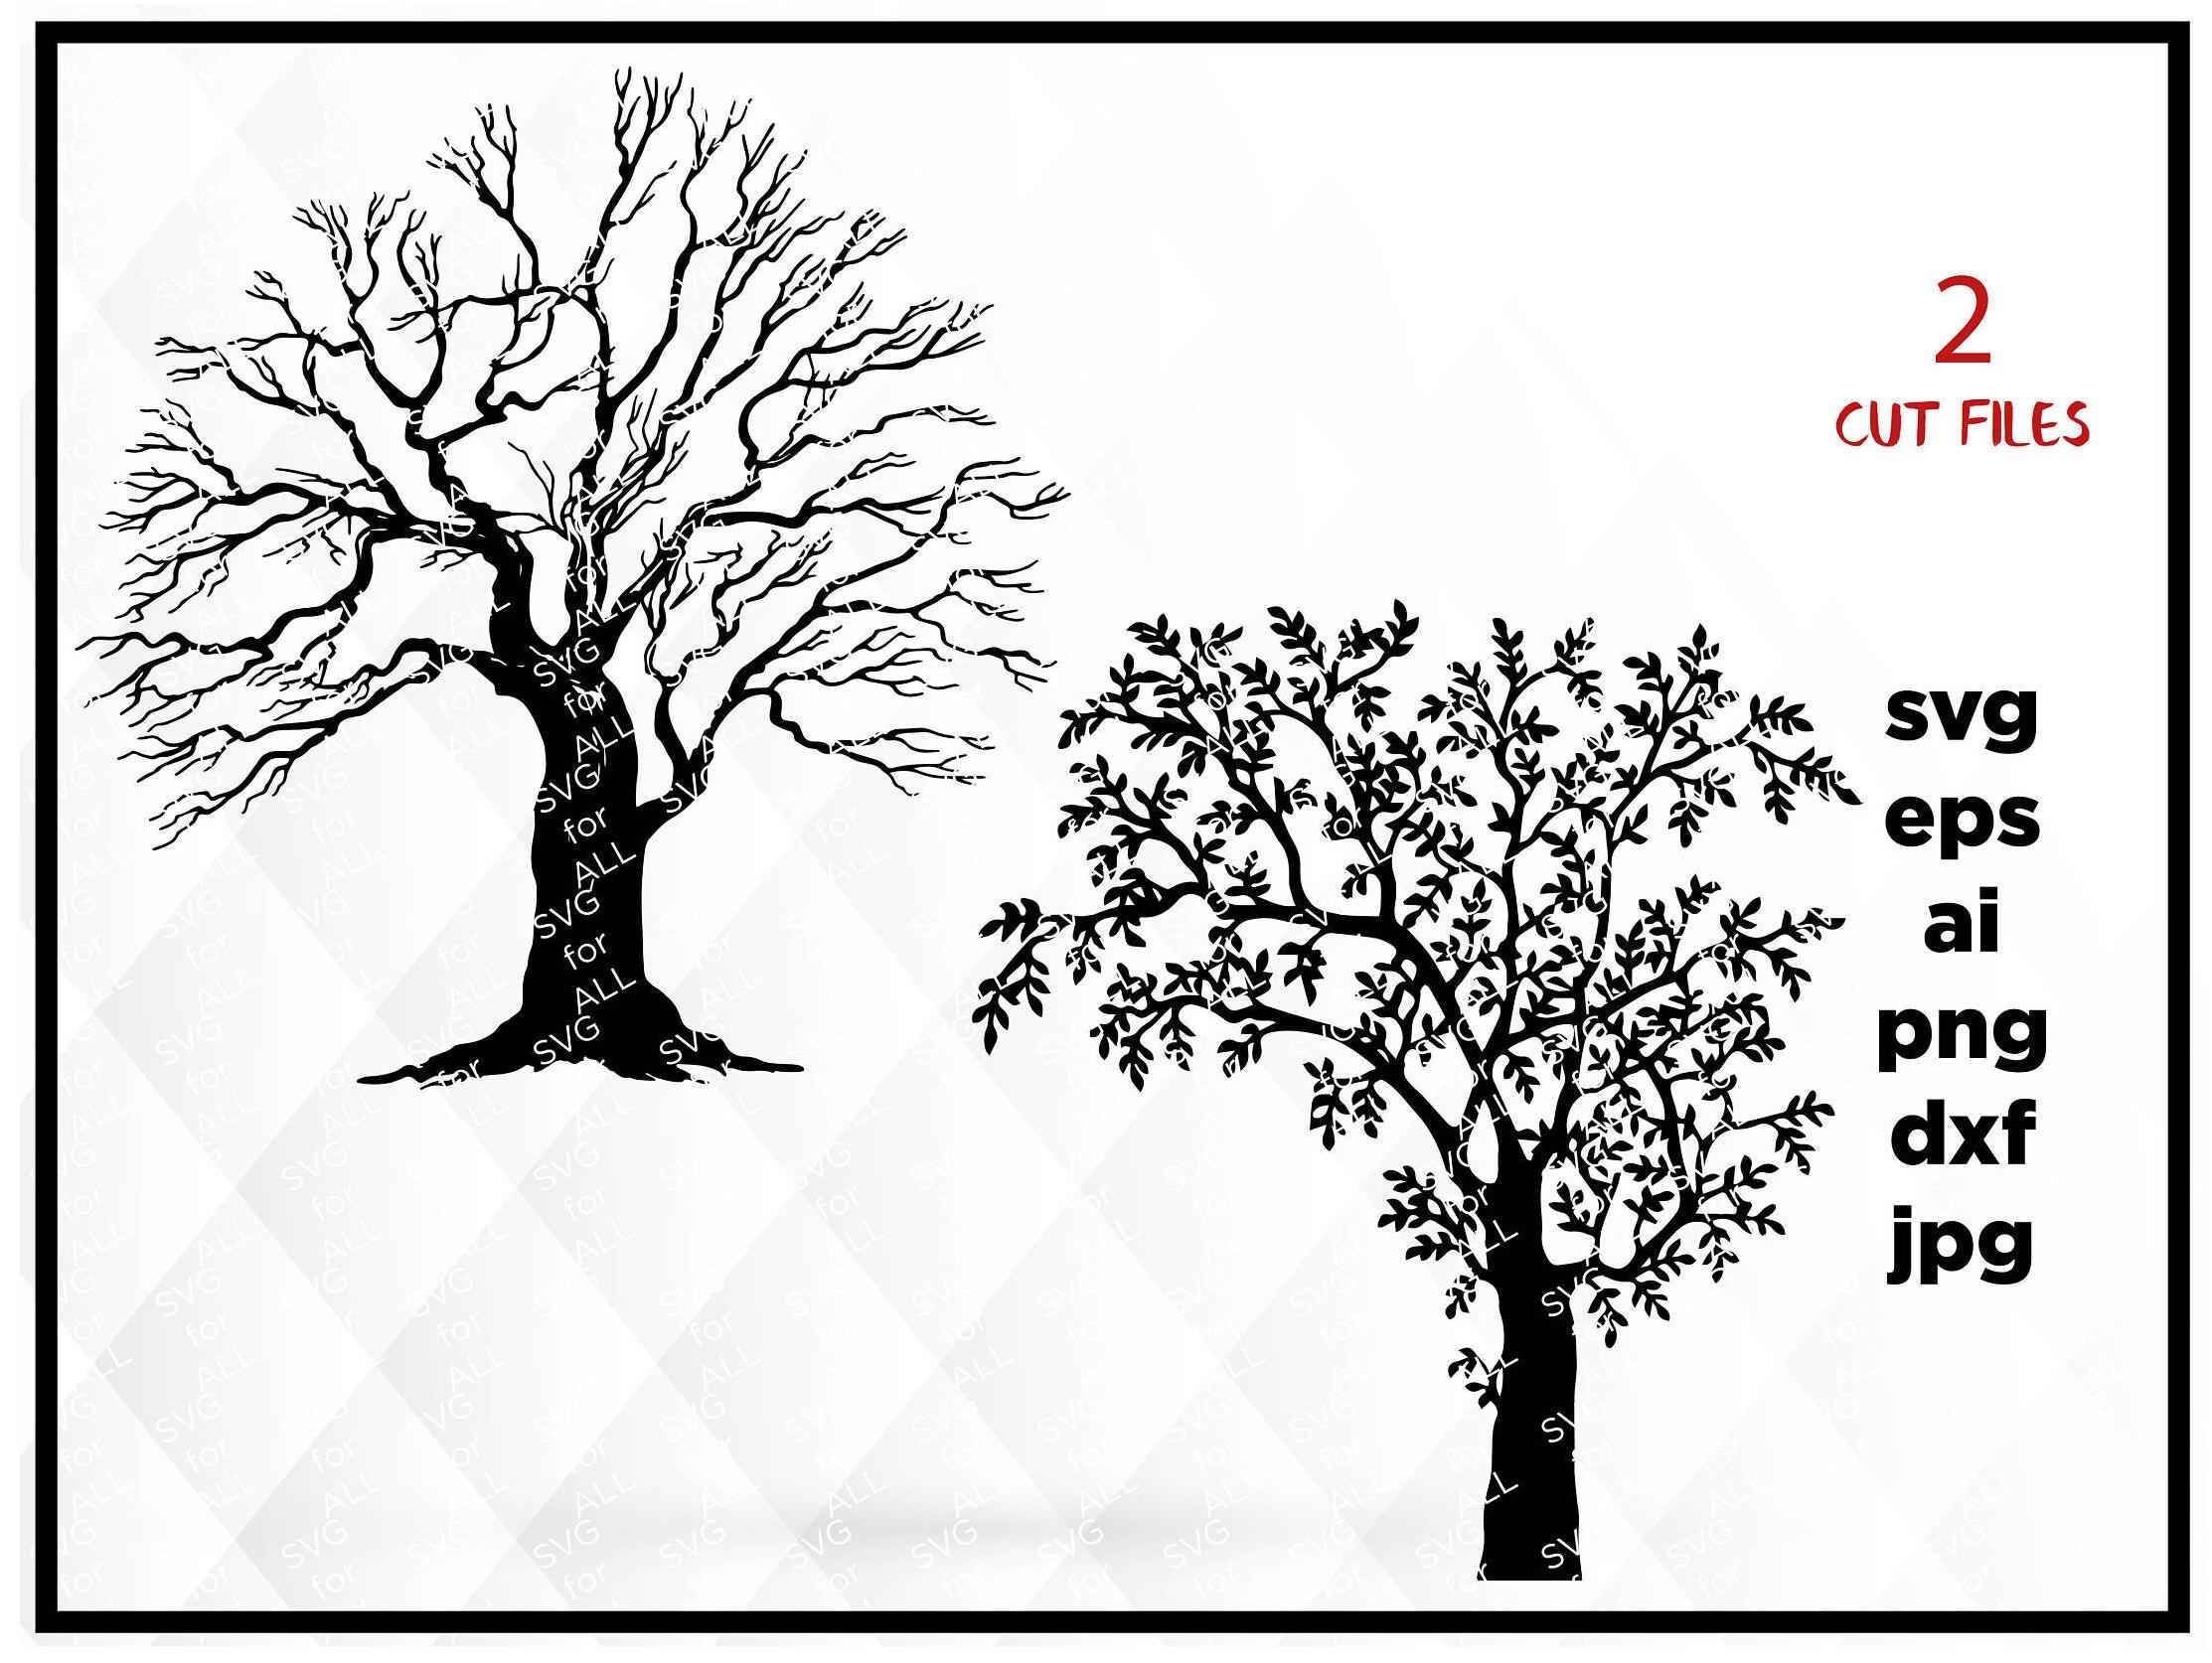 Baum Baum Clipart Baum schneiden Datei SVG-Datei